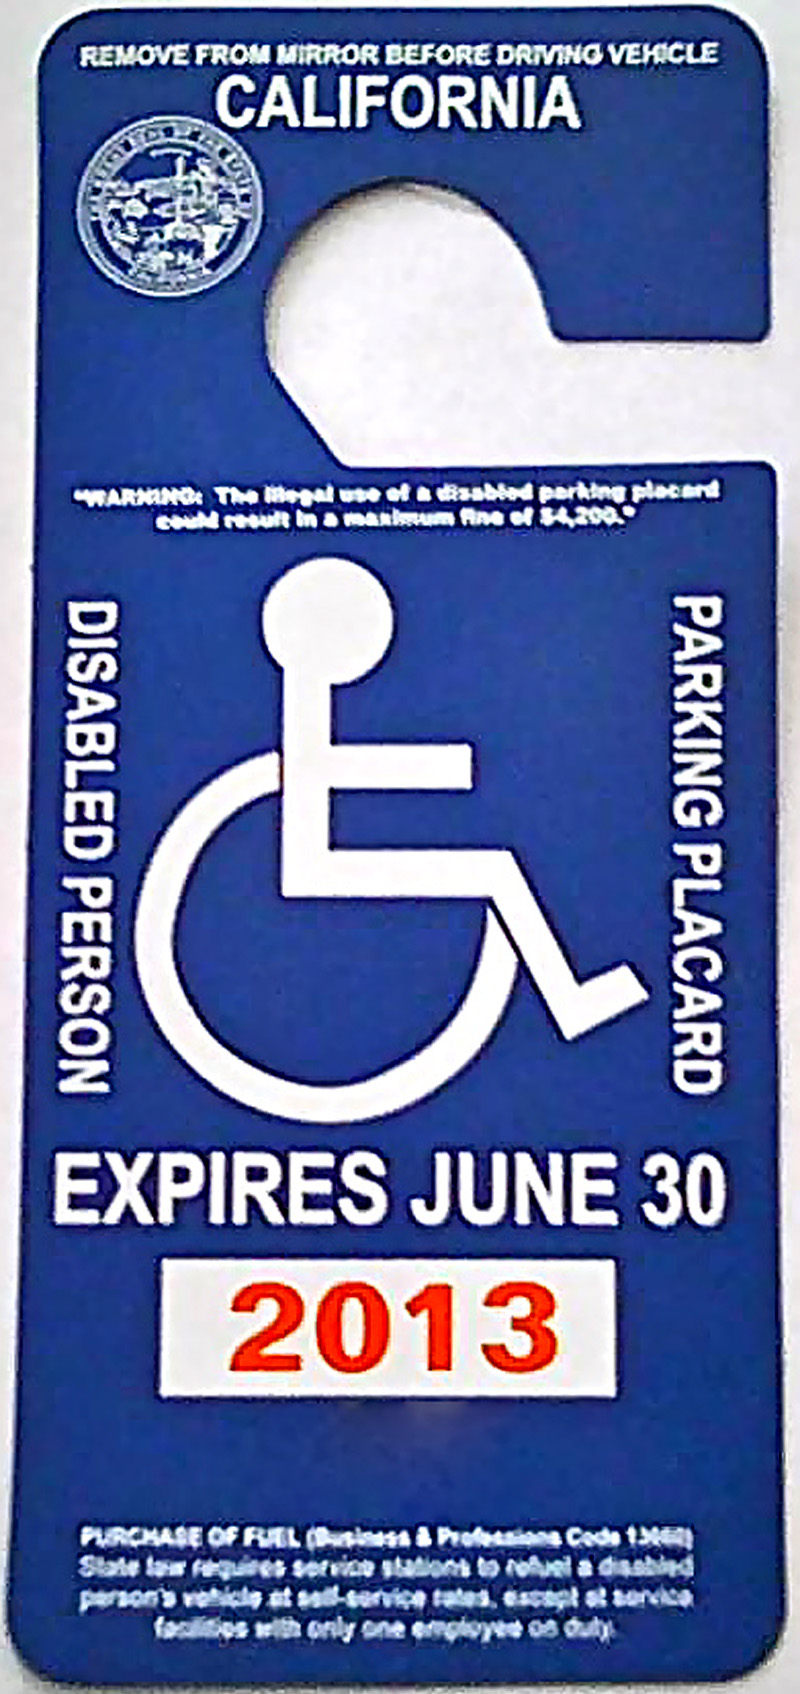 Scvnews Com Dmv Going After Disabled Placard Fraudsters